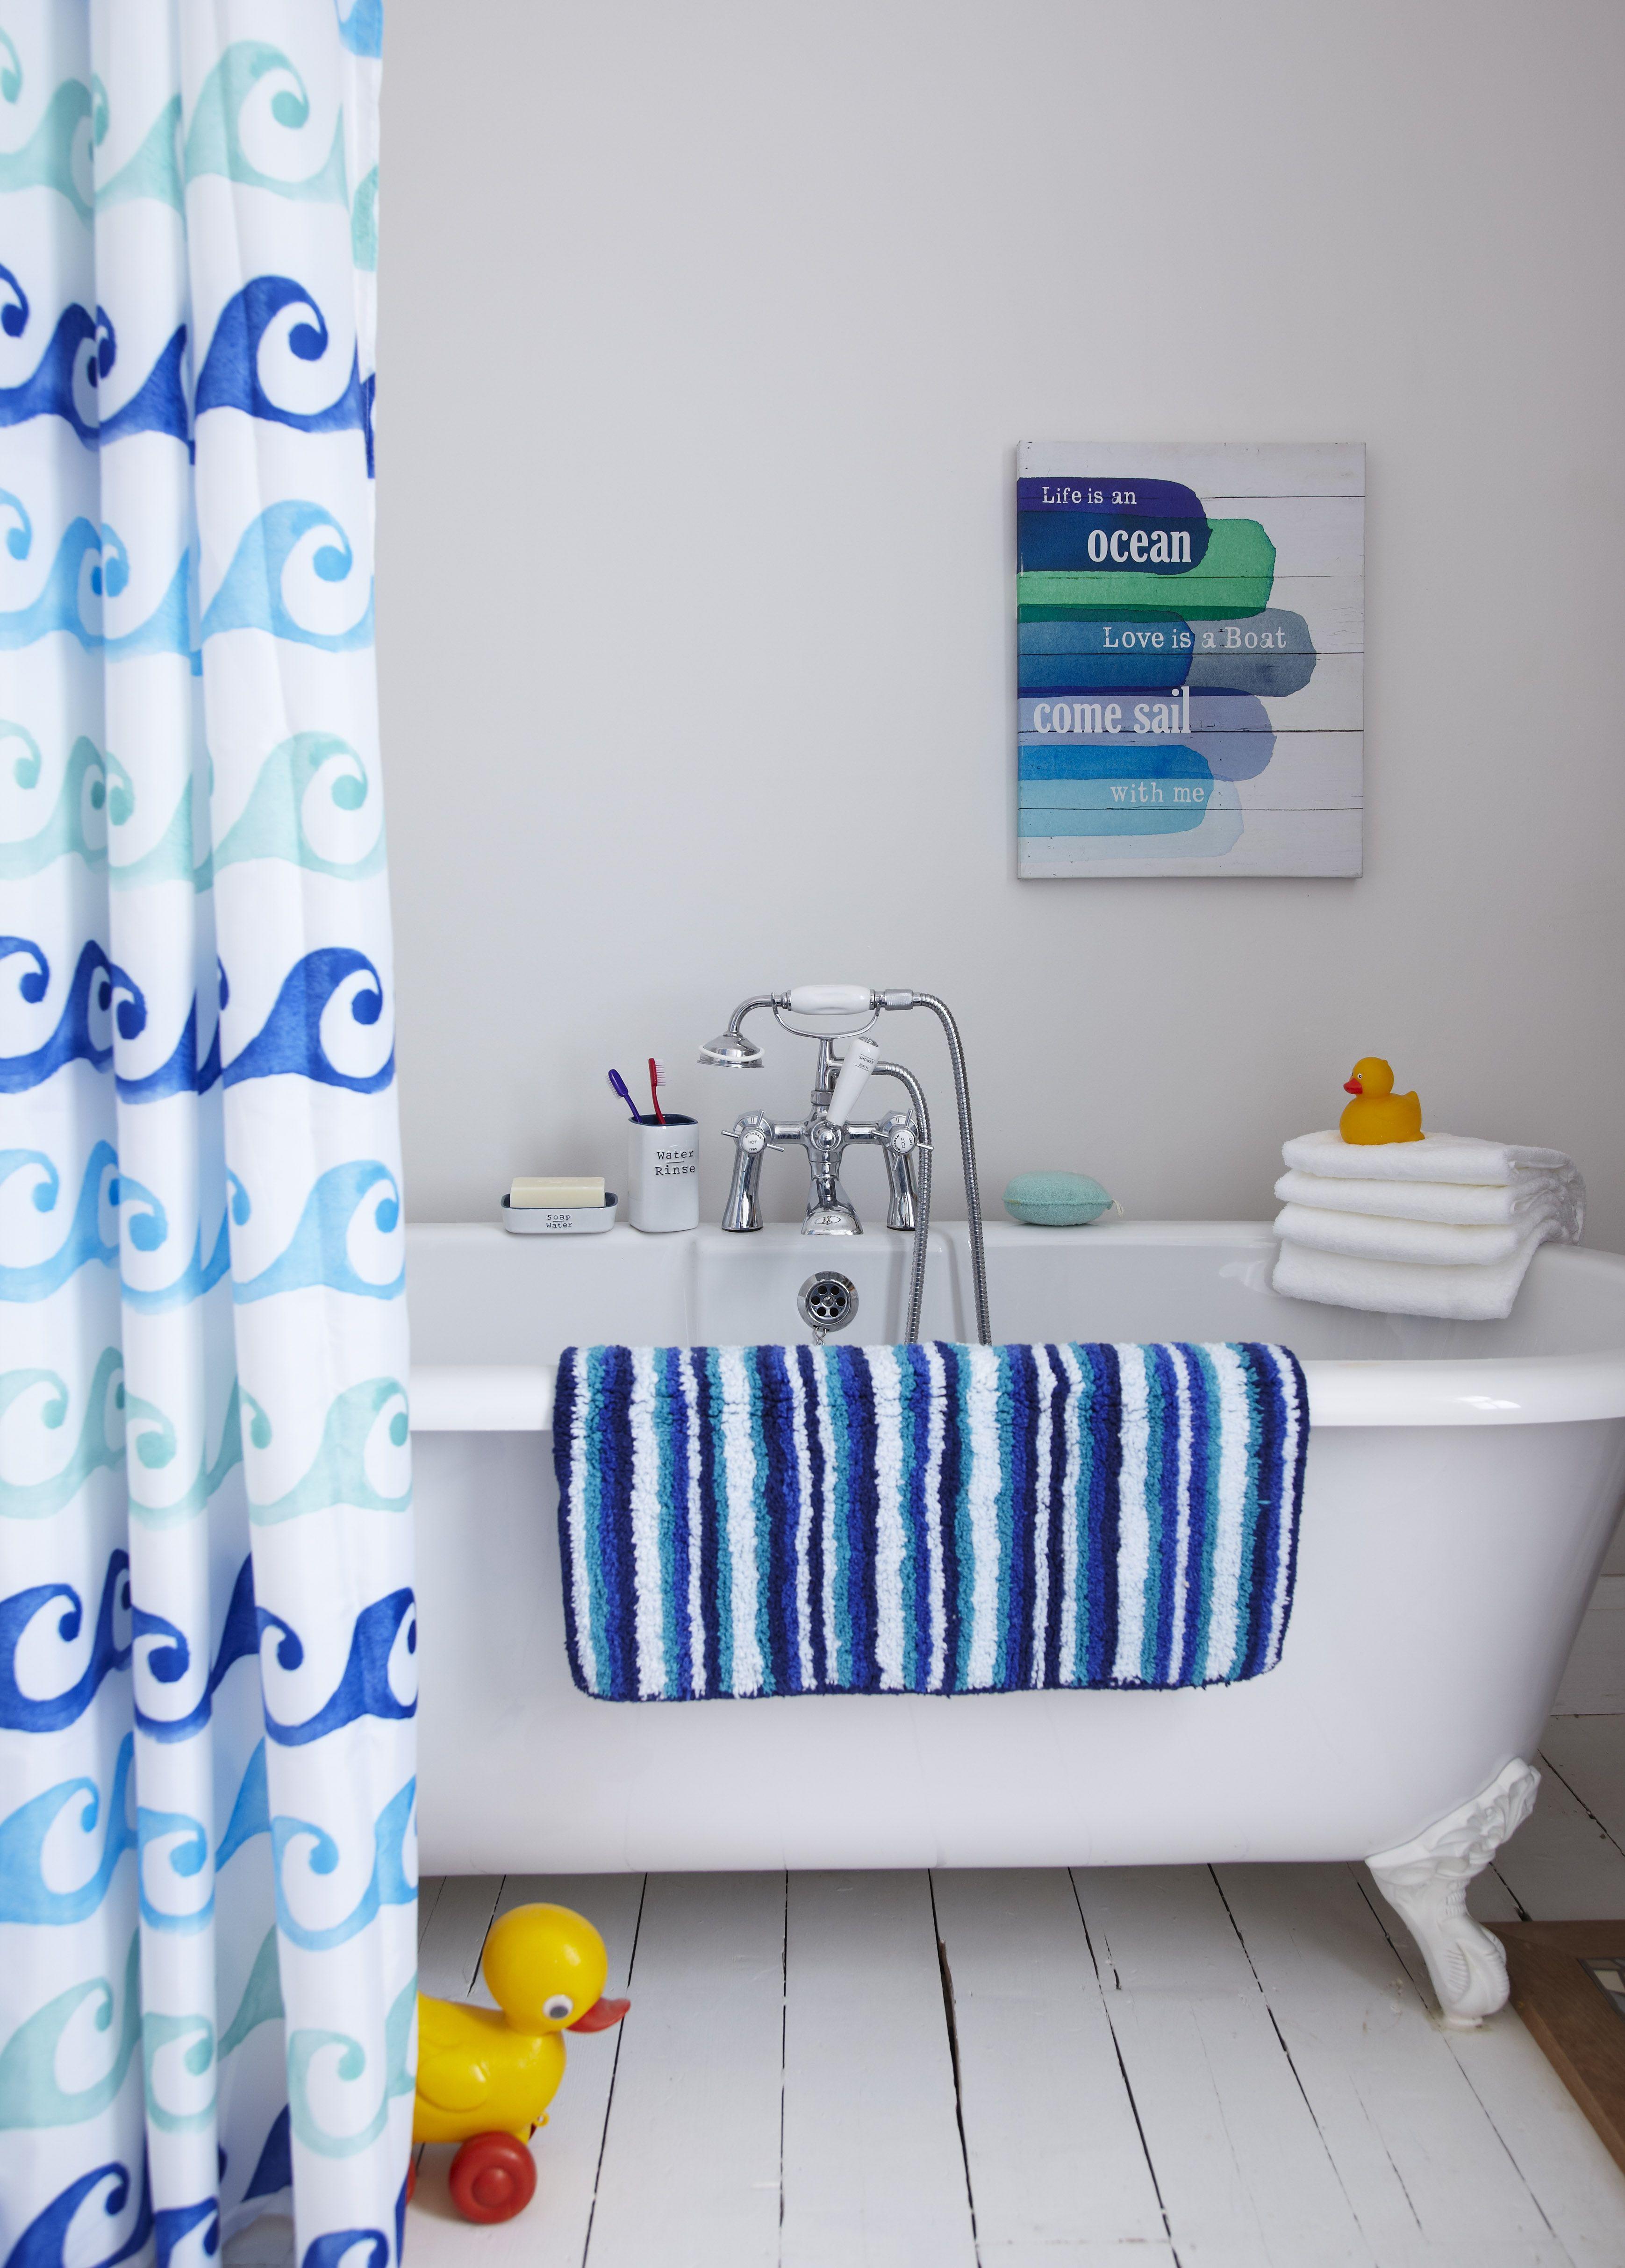 Nautical blue bathroom tub setting | Spring/summer interior ideas ...